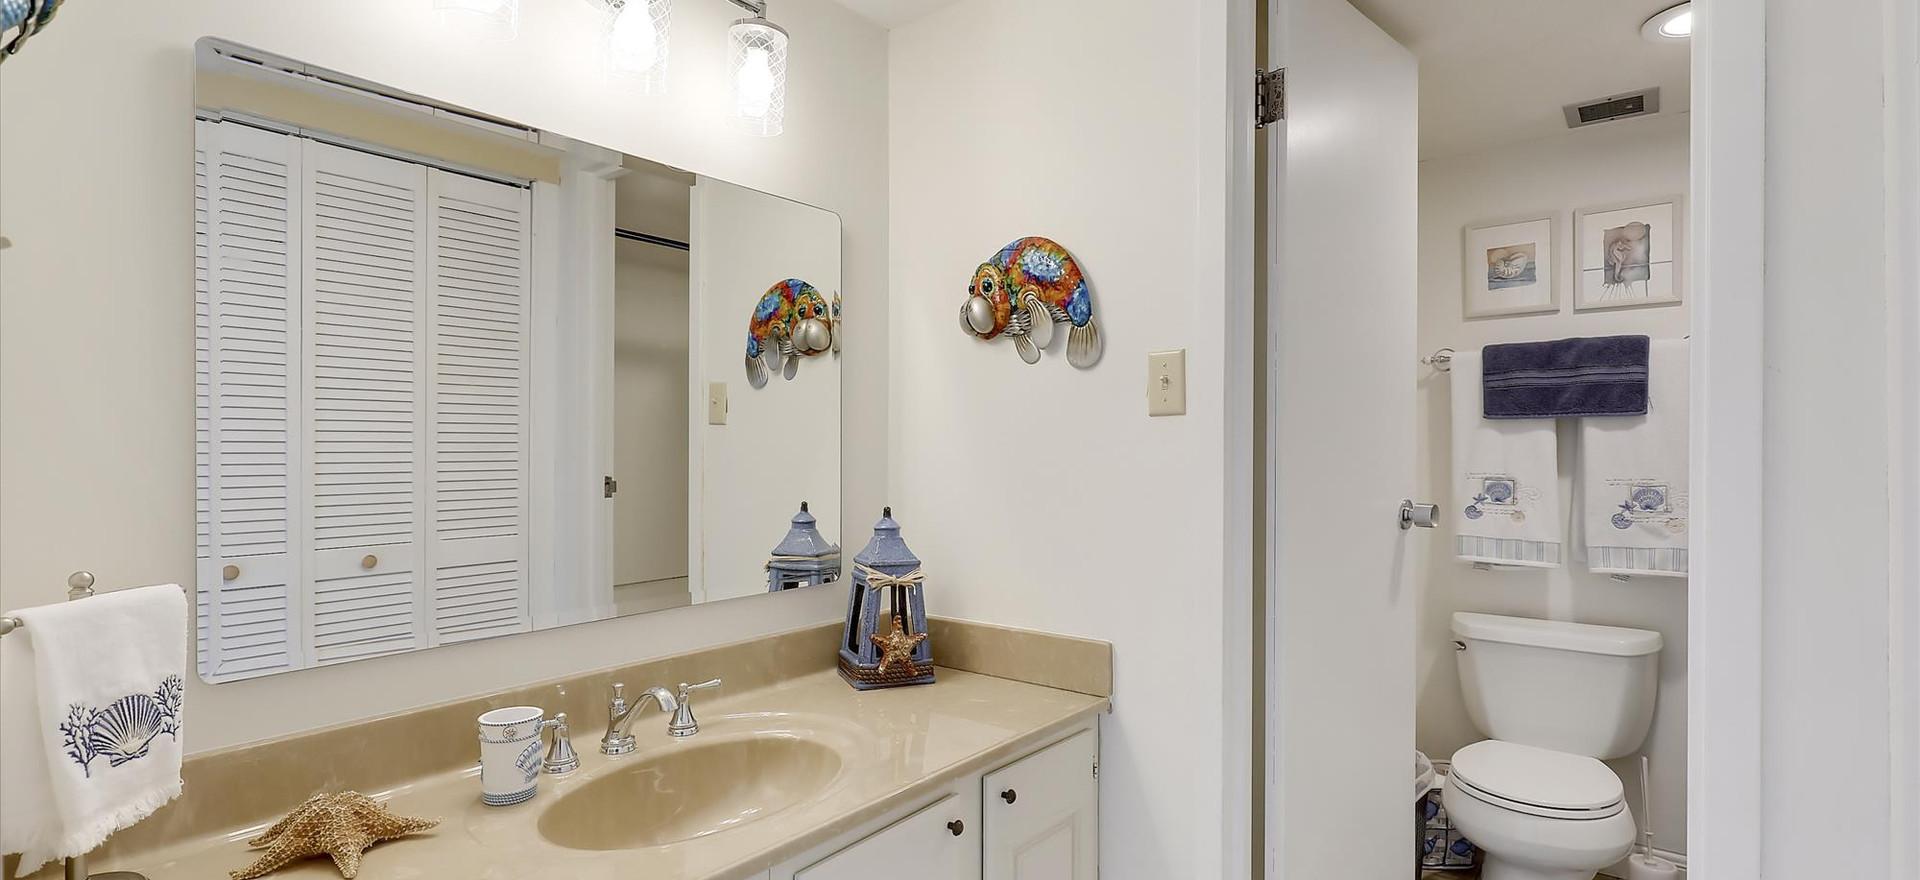 Upstairs Vanity and Bathroom